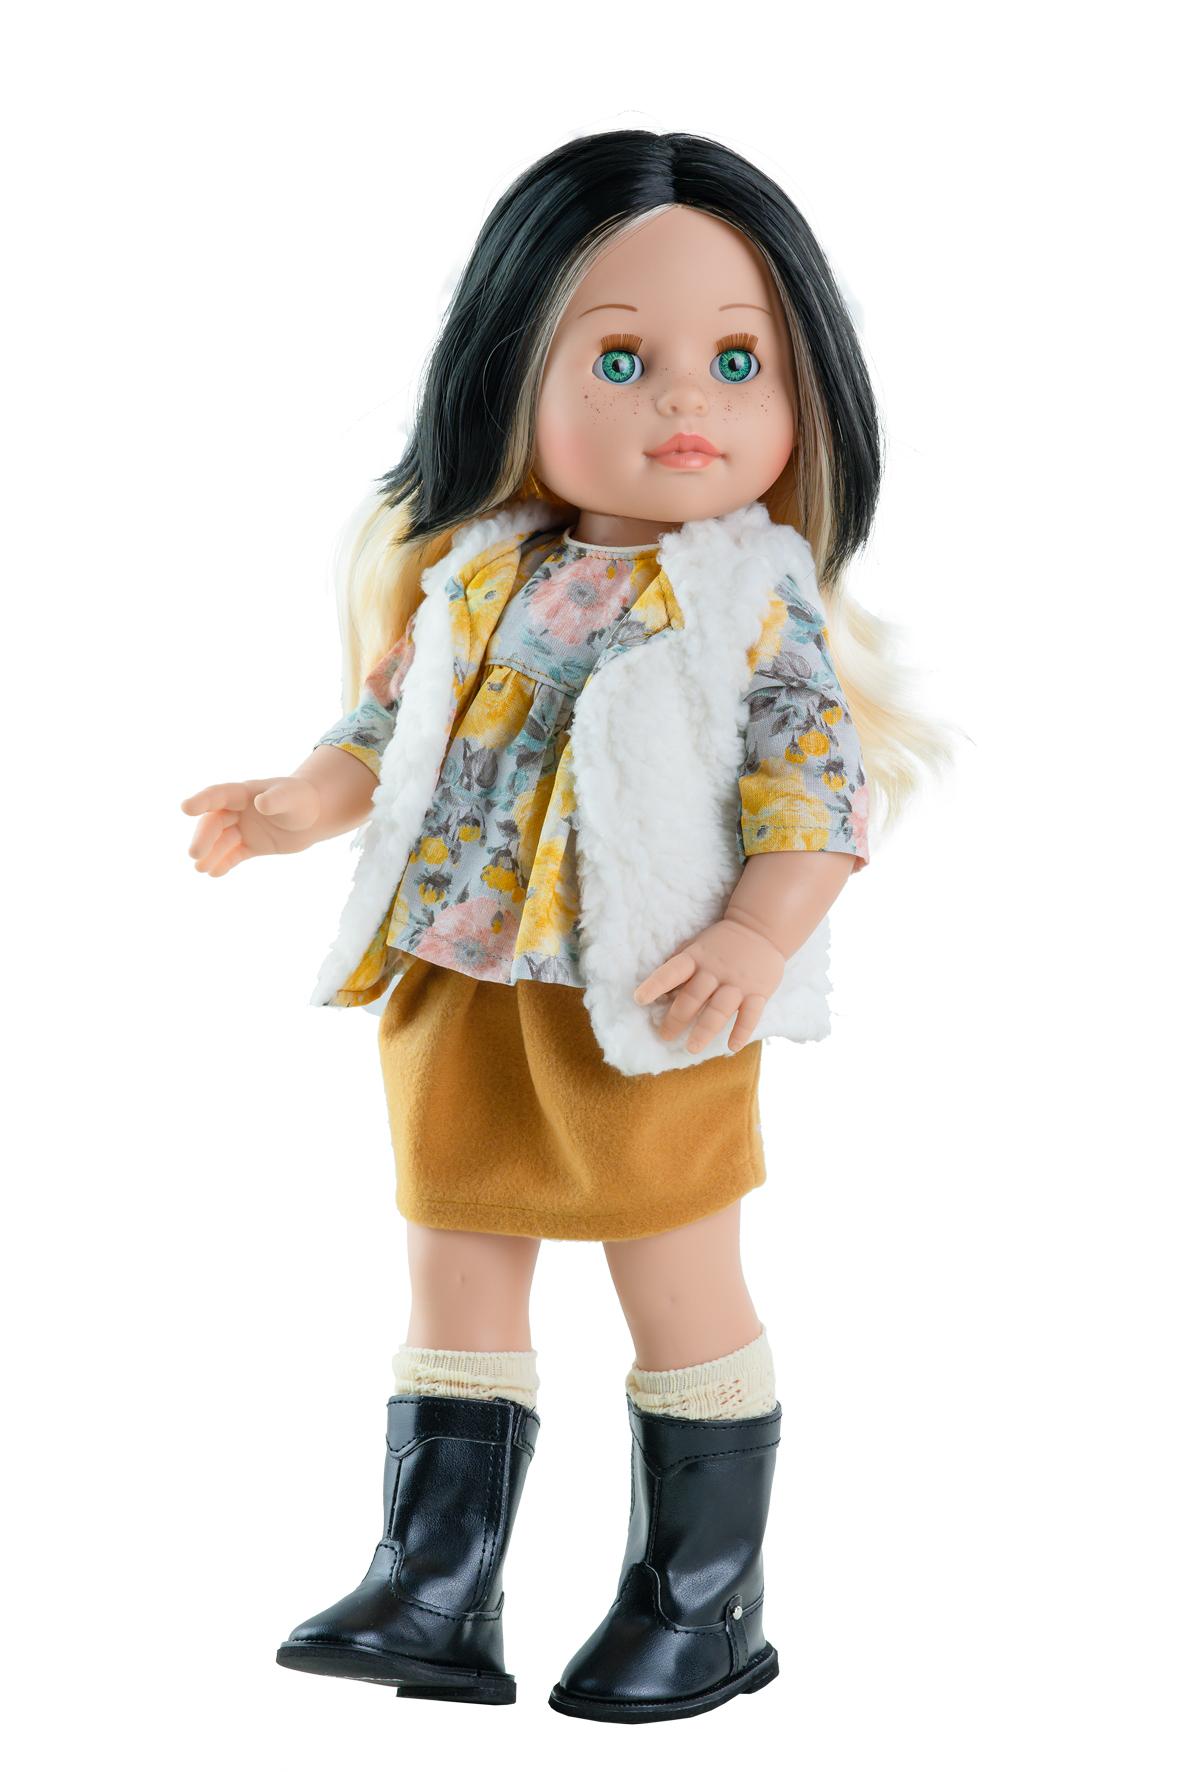 Realistická panenka Bianca v kožíšku od f. Paola Reina